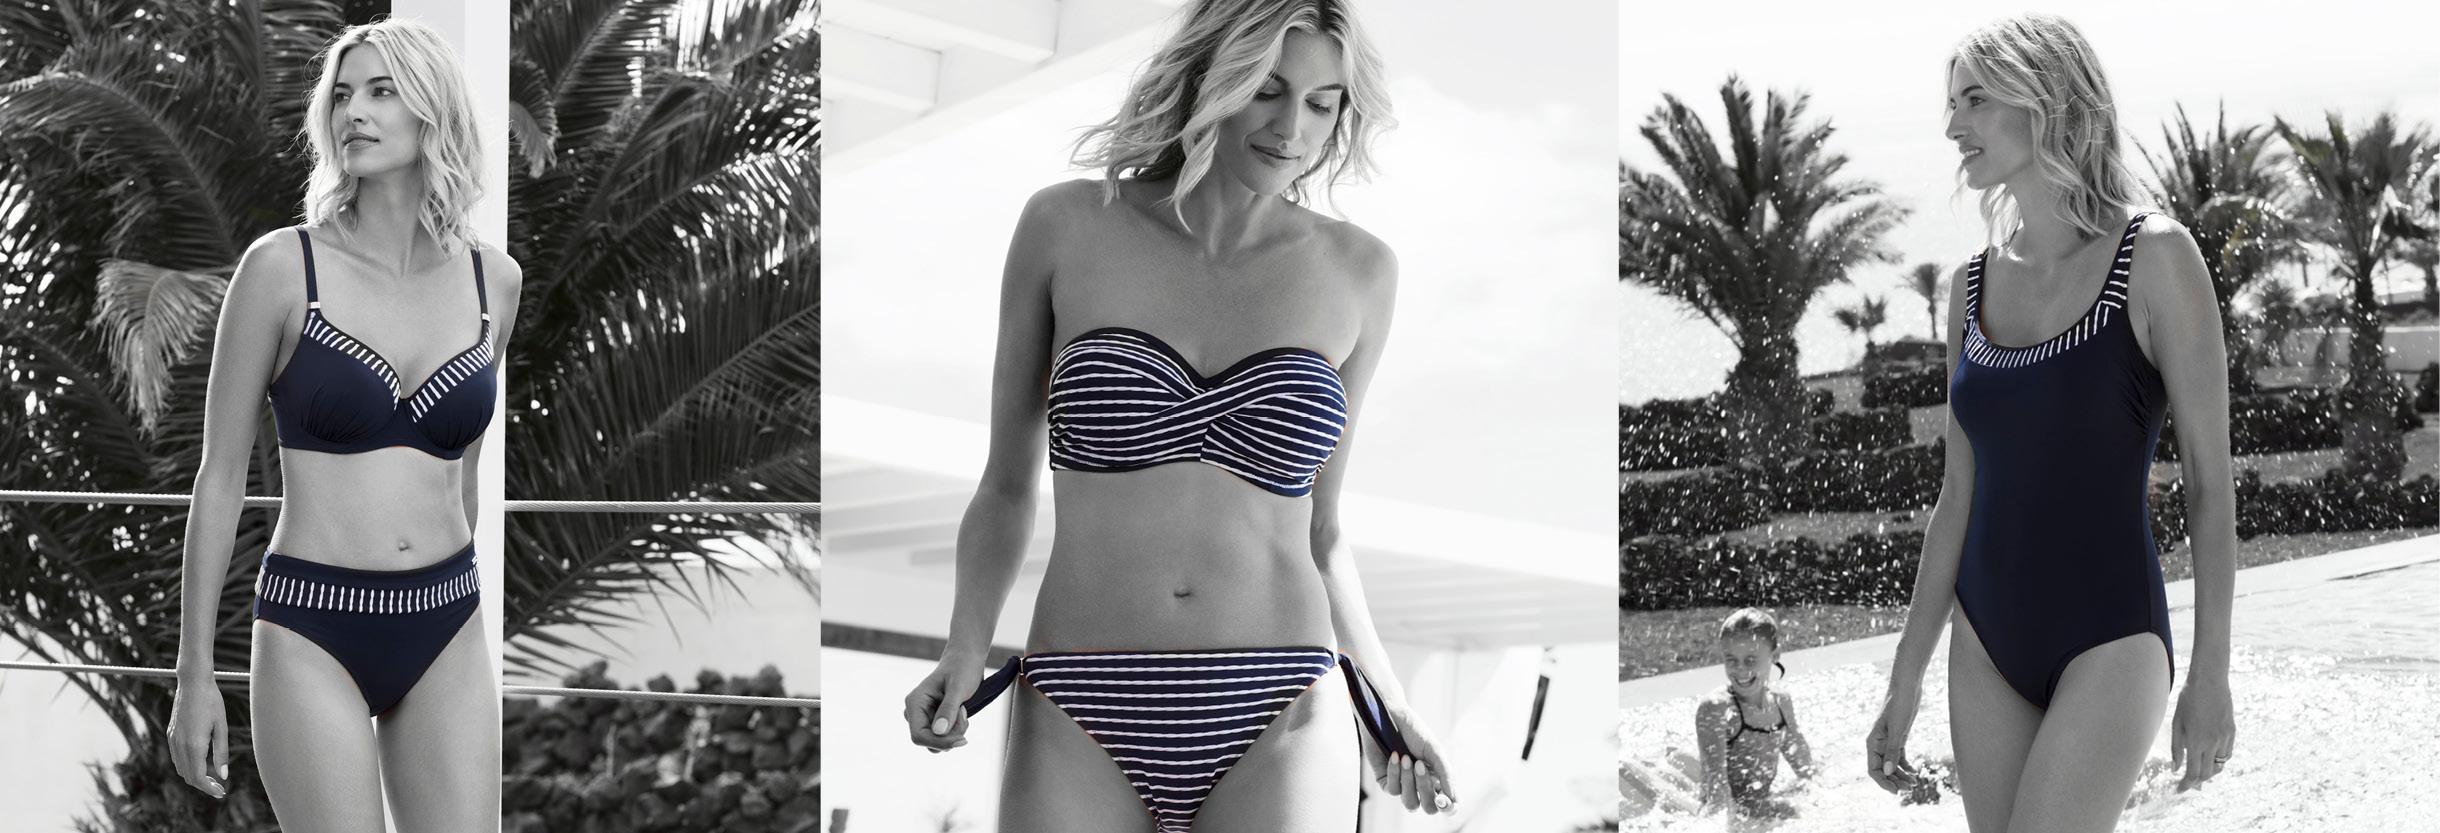 Fantasie badmode San Remo bikini's en badpakken grote maten